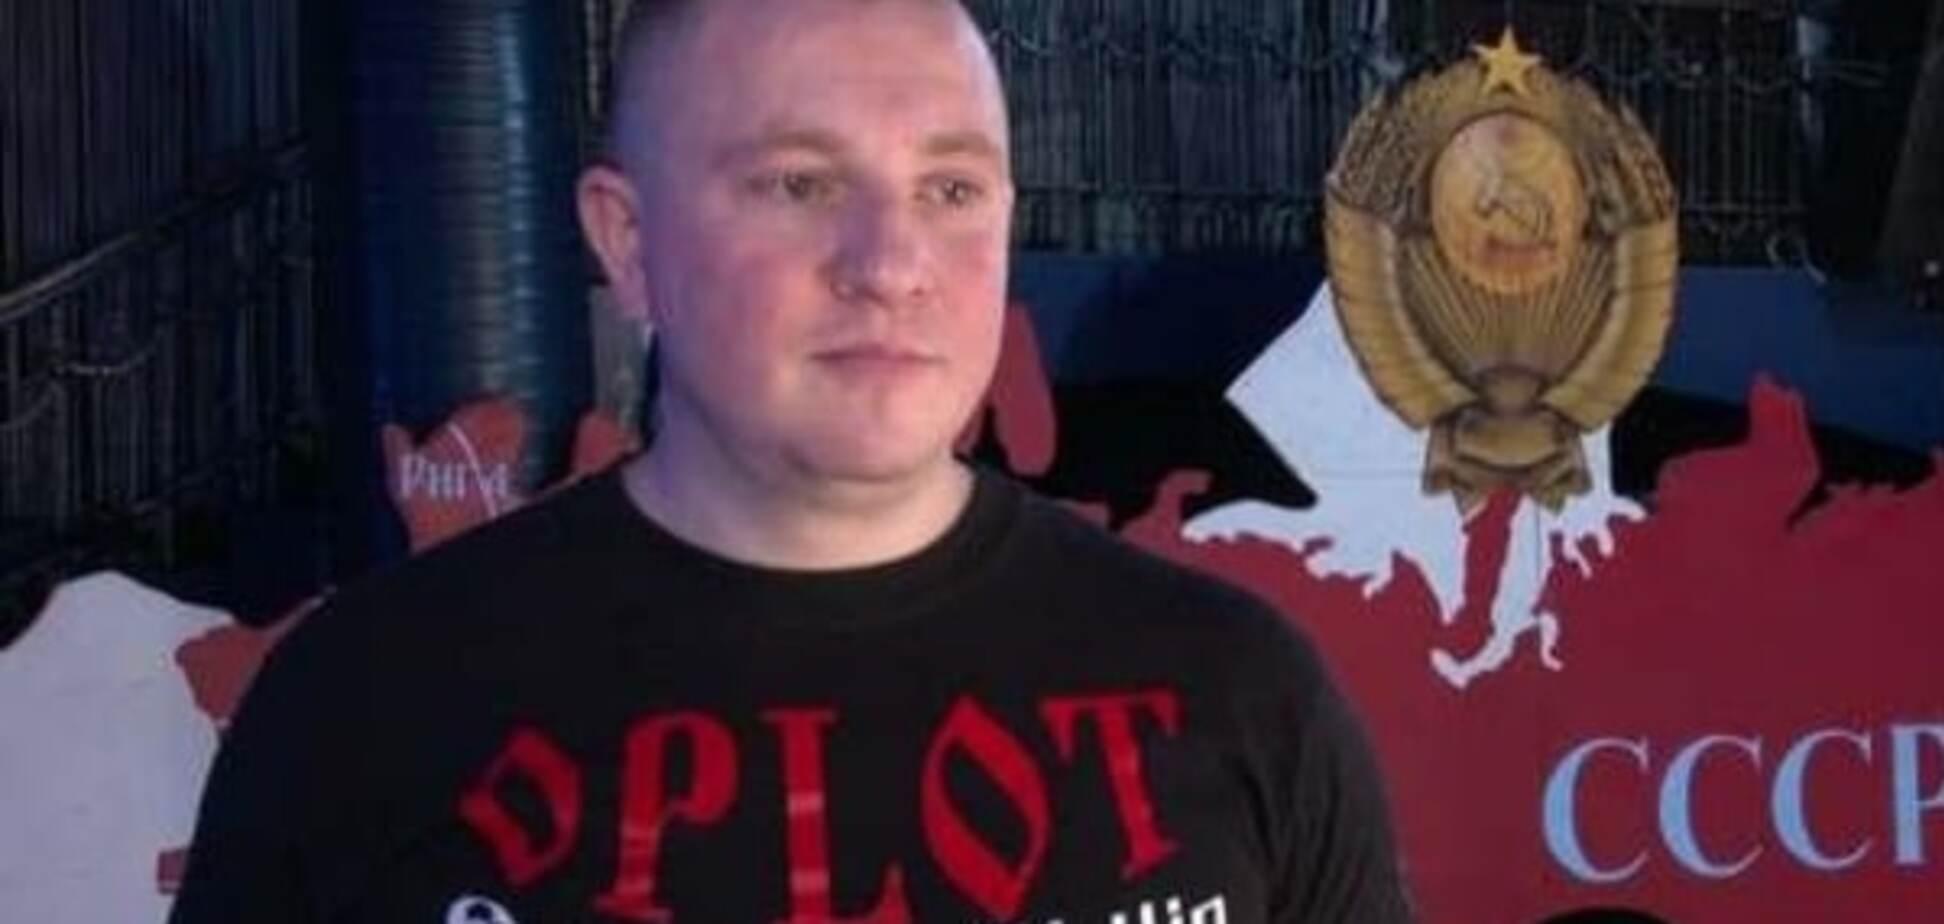 Не прошло и трех лет: суд заочно арестовал одиозного 'антимайдановца'